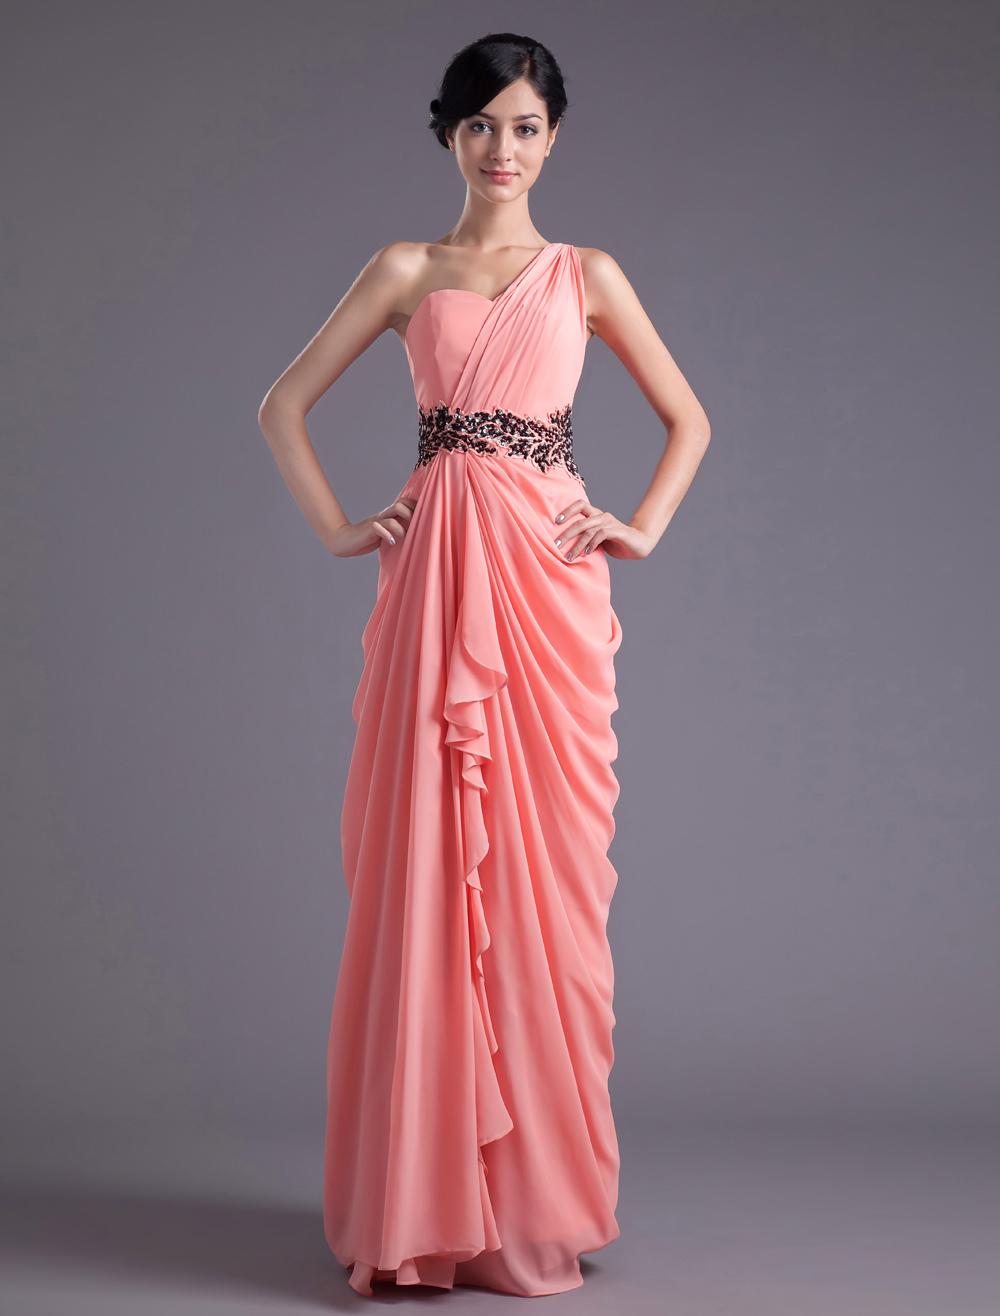 Sheath Watermelon Chiffon Beading One-Shoulder Floor-Length Wedding Bridesmaid Dress